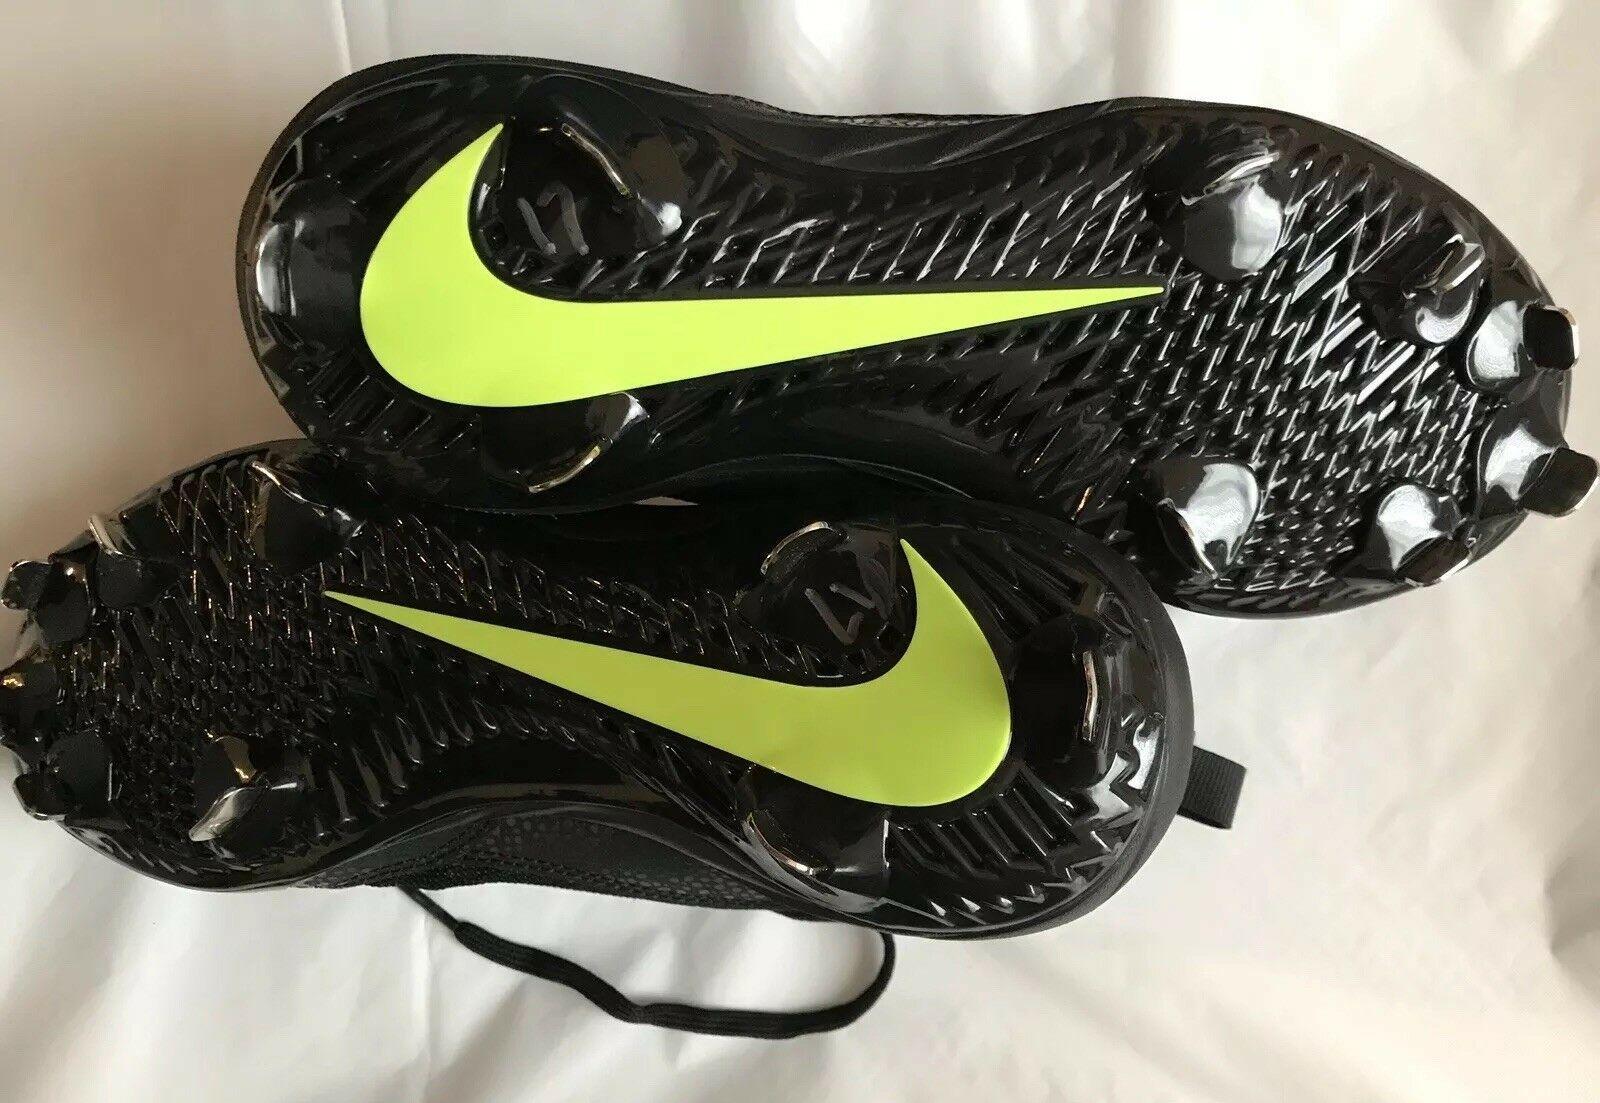 7452cfee432ec Men s Baseball Nike Hyper Diamond Size 9.5 and 50 similar items